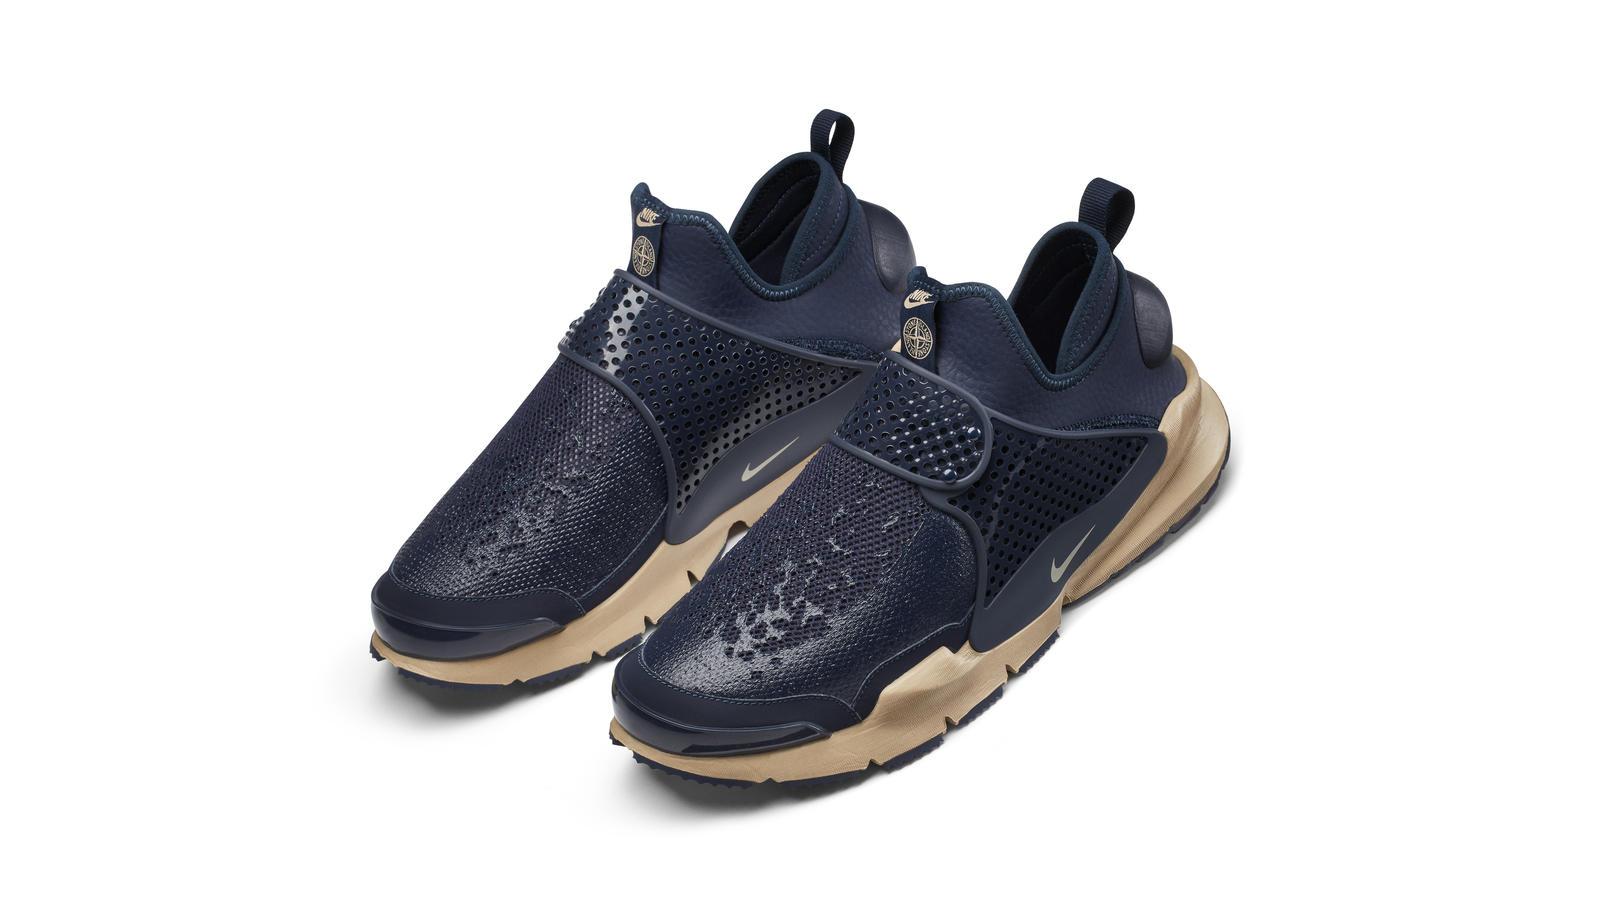 baf6a7060f945 The NikeLab Sock Dart Mid x Stone Island - Nike News